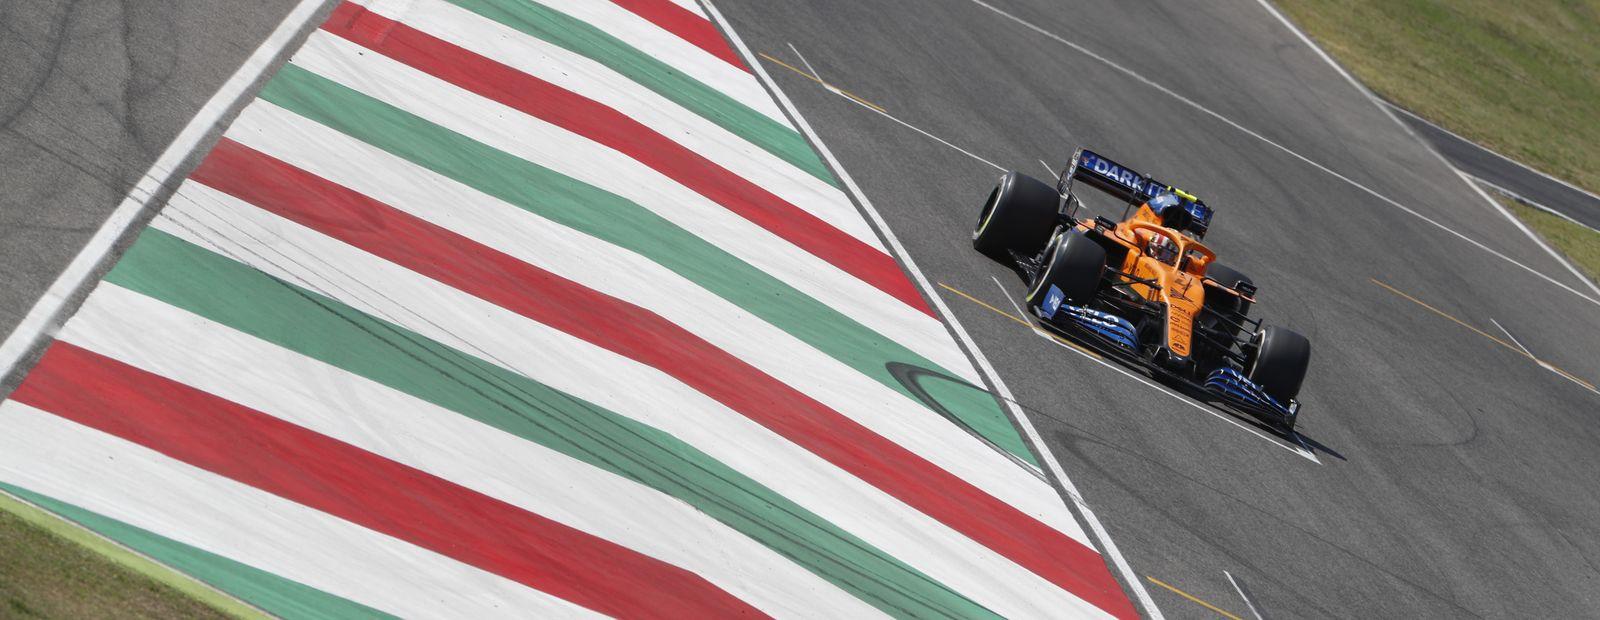 2020 Tuscan Grand Prix – Free Practice